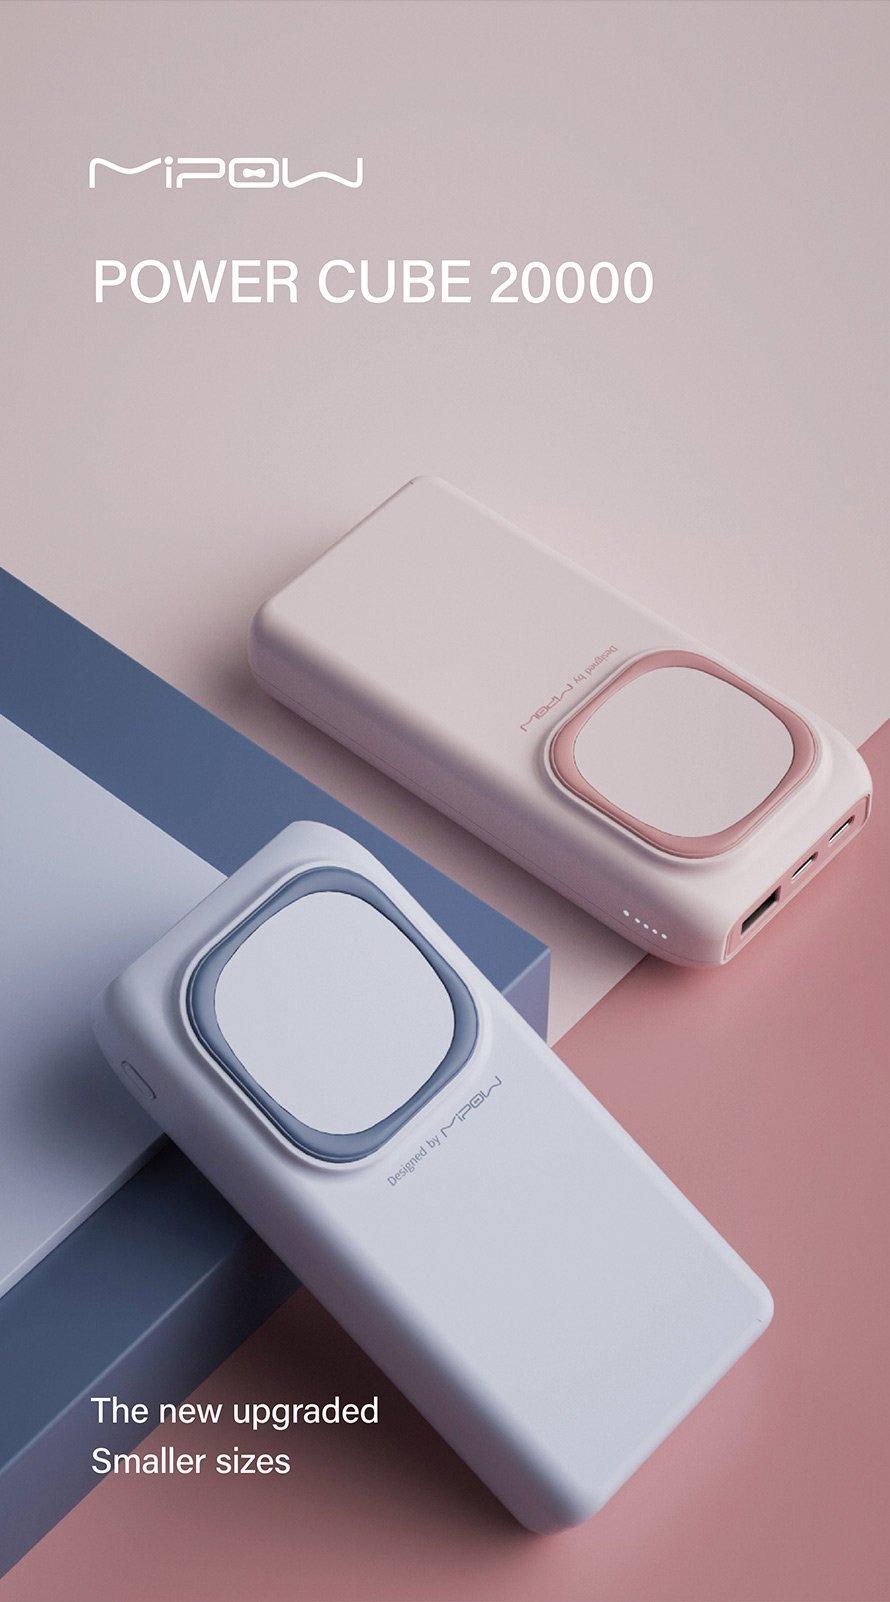 sac-du-phong-kiem-sac-khong-day-mipow-power-cube-20000-pd-18w-qi-10w-wireless-ch